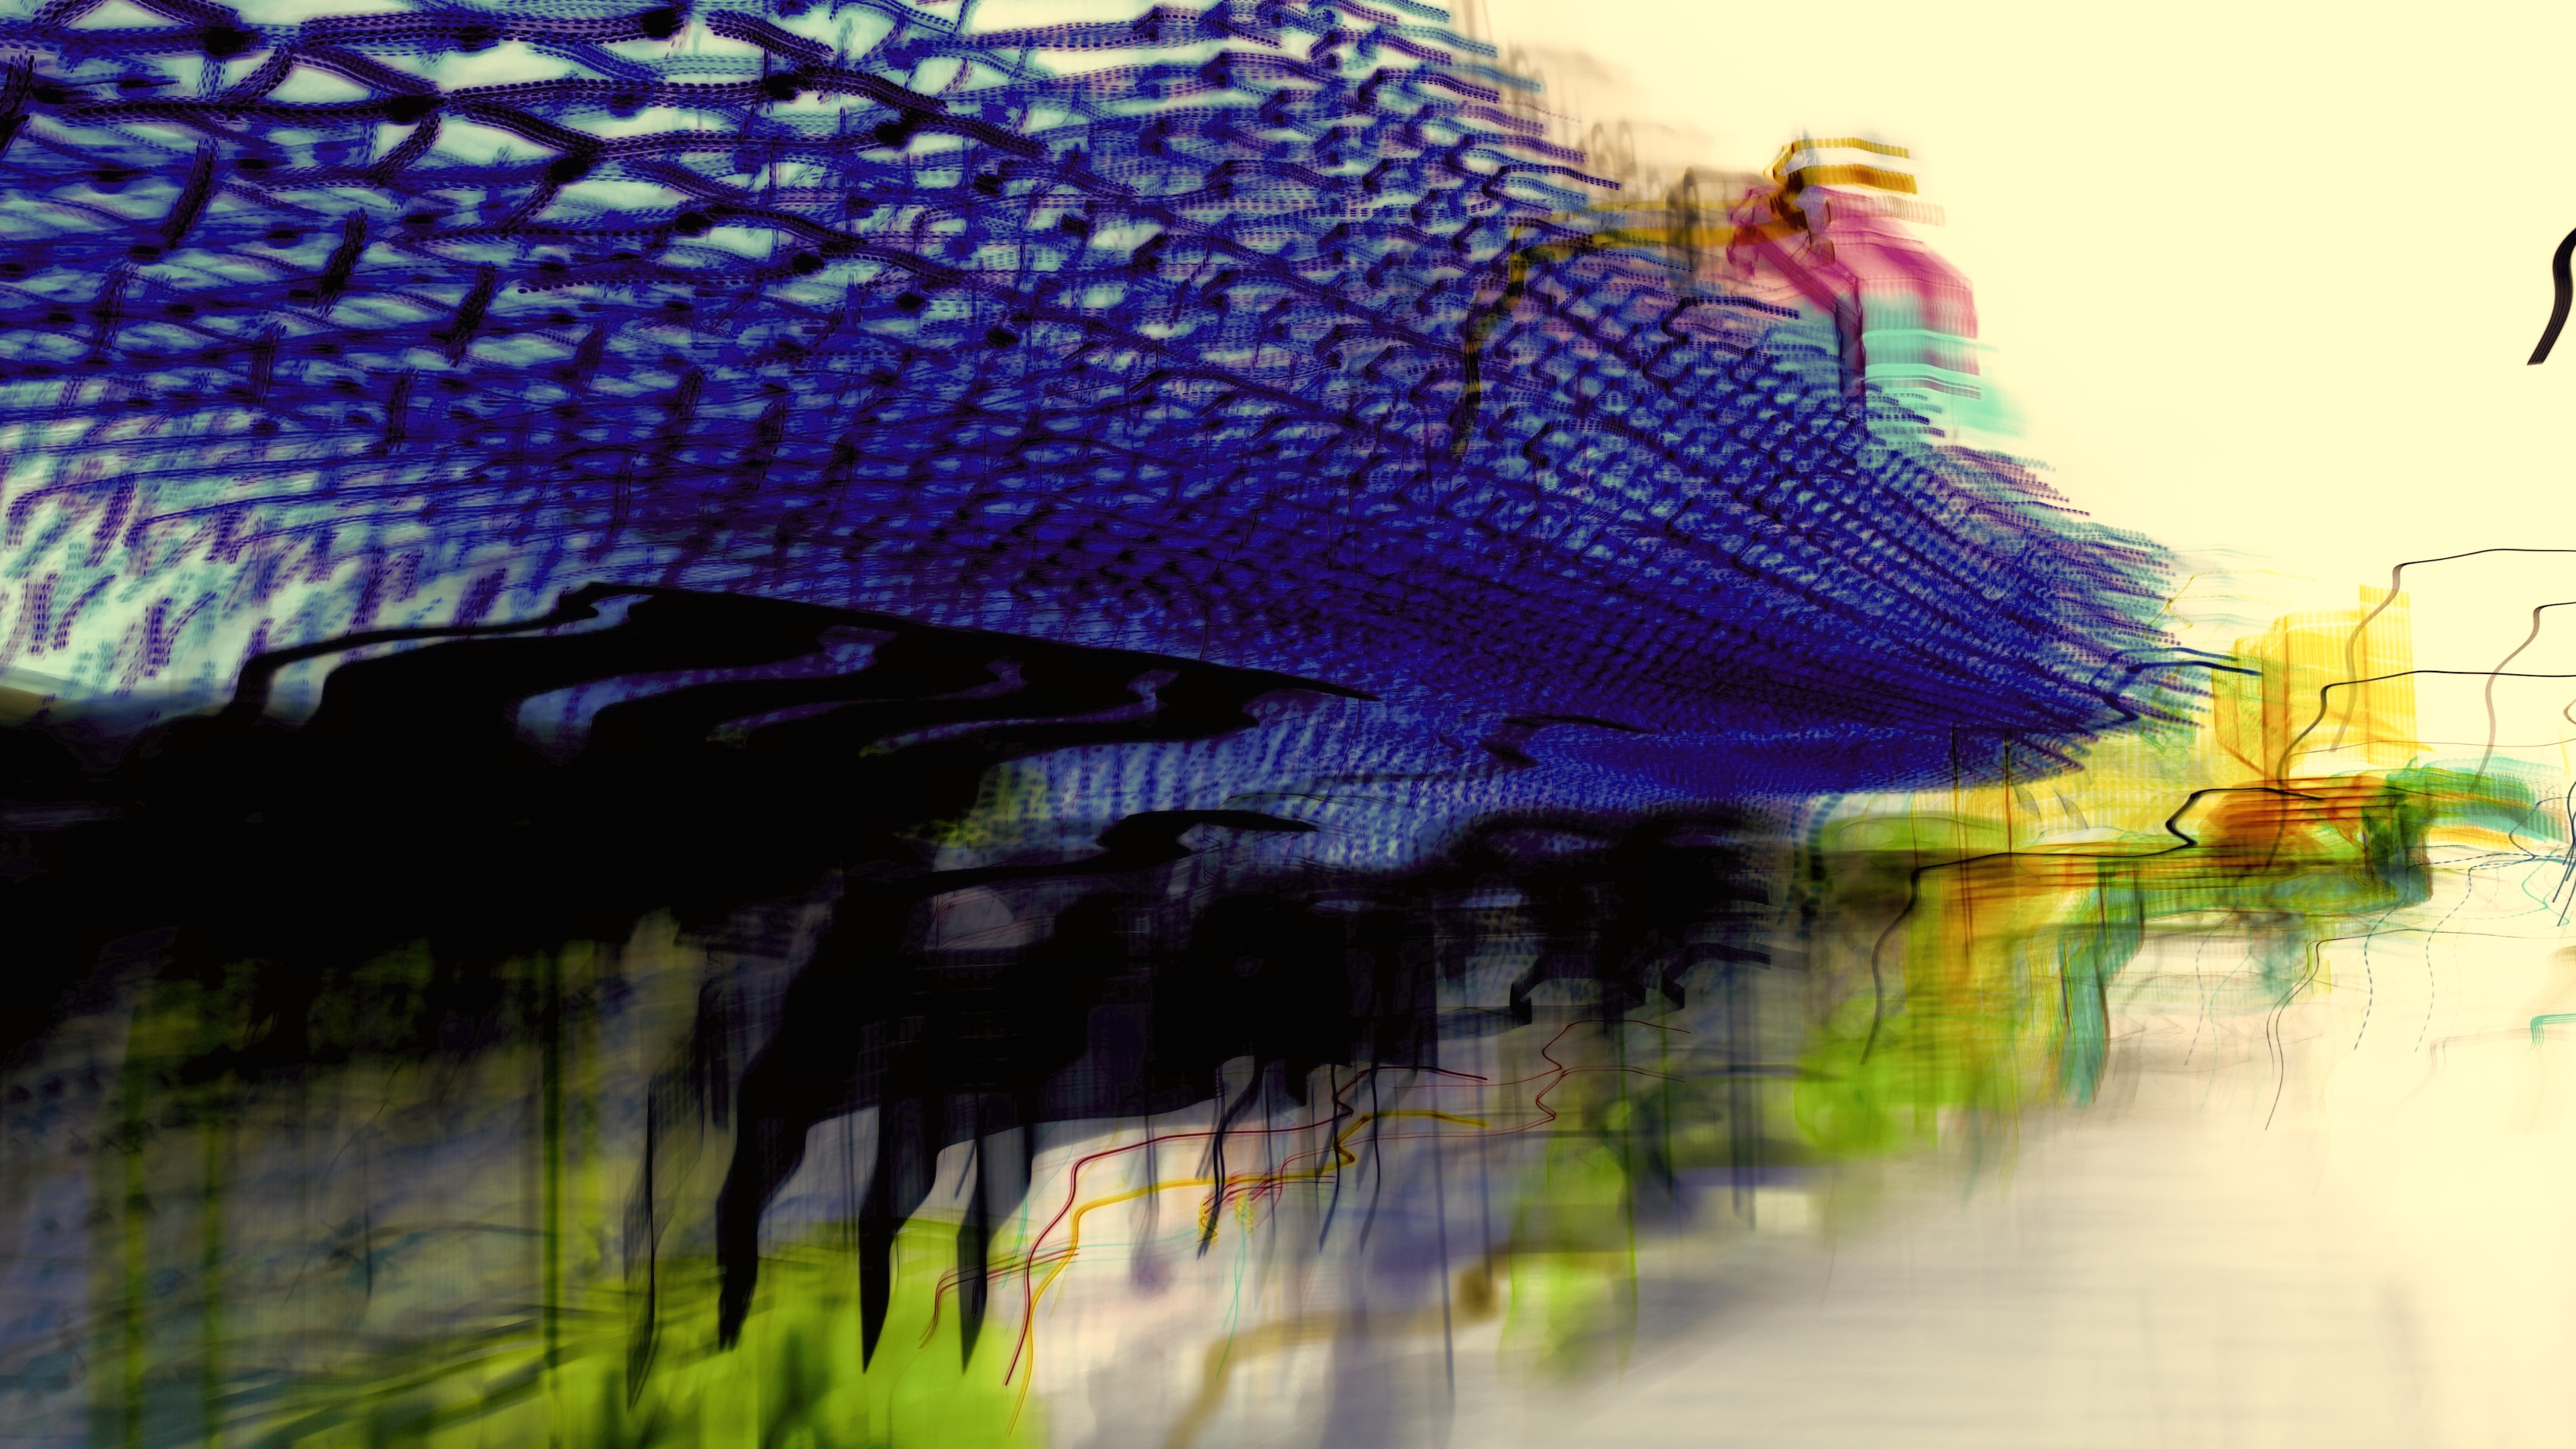 Arcade Abstract Image 1